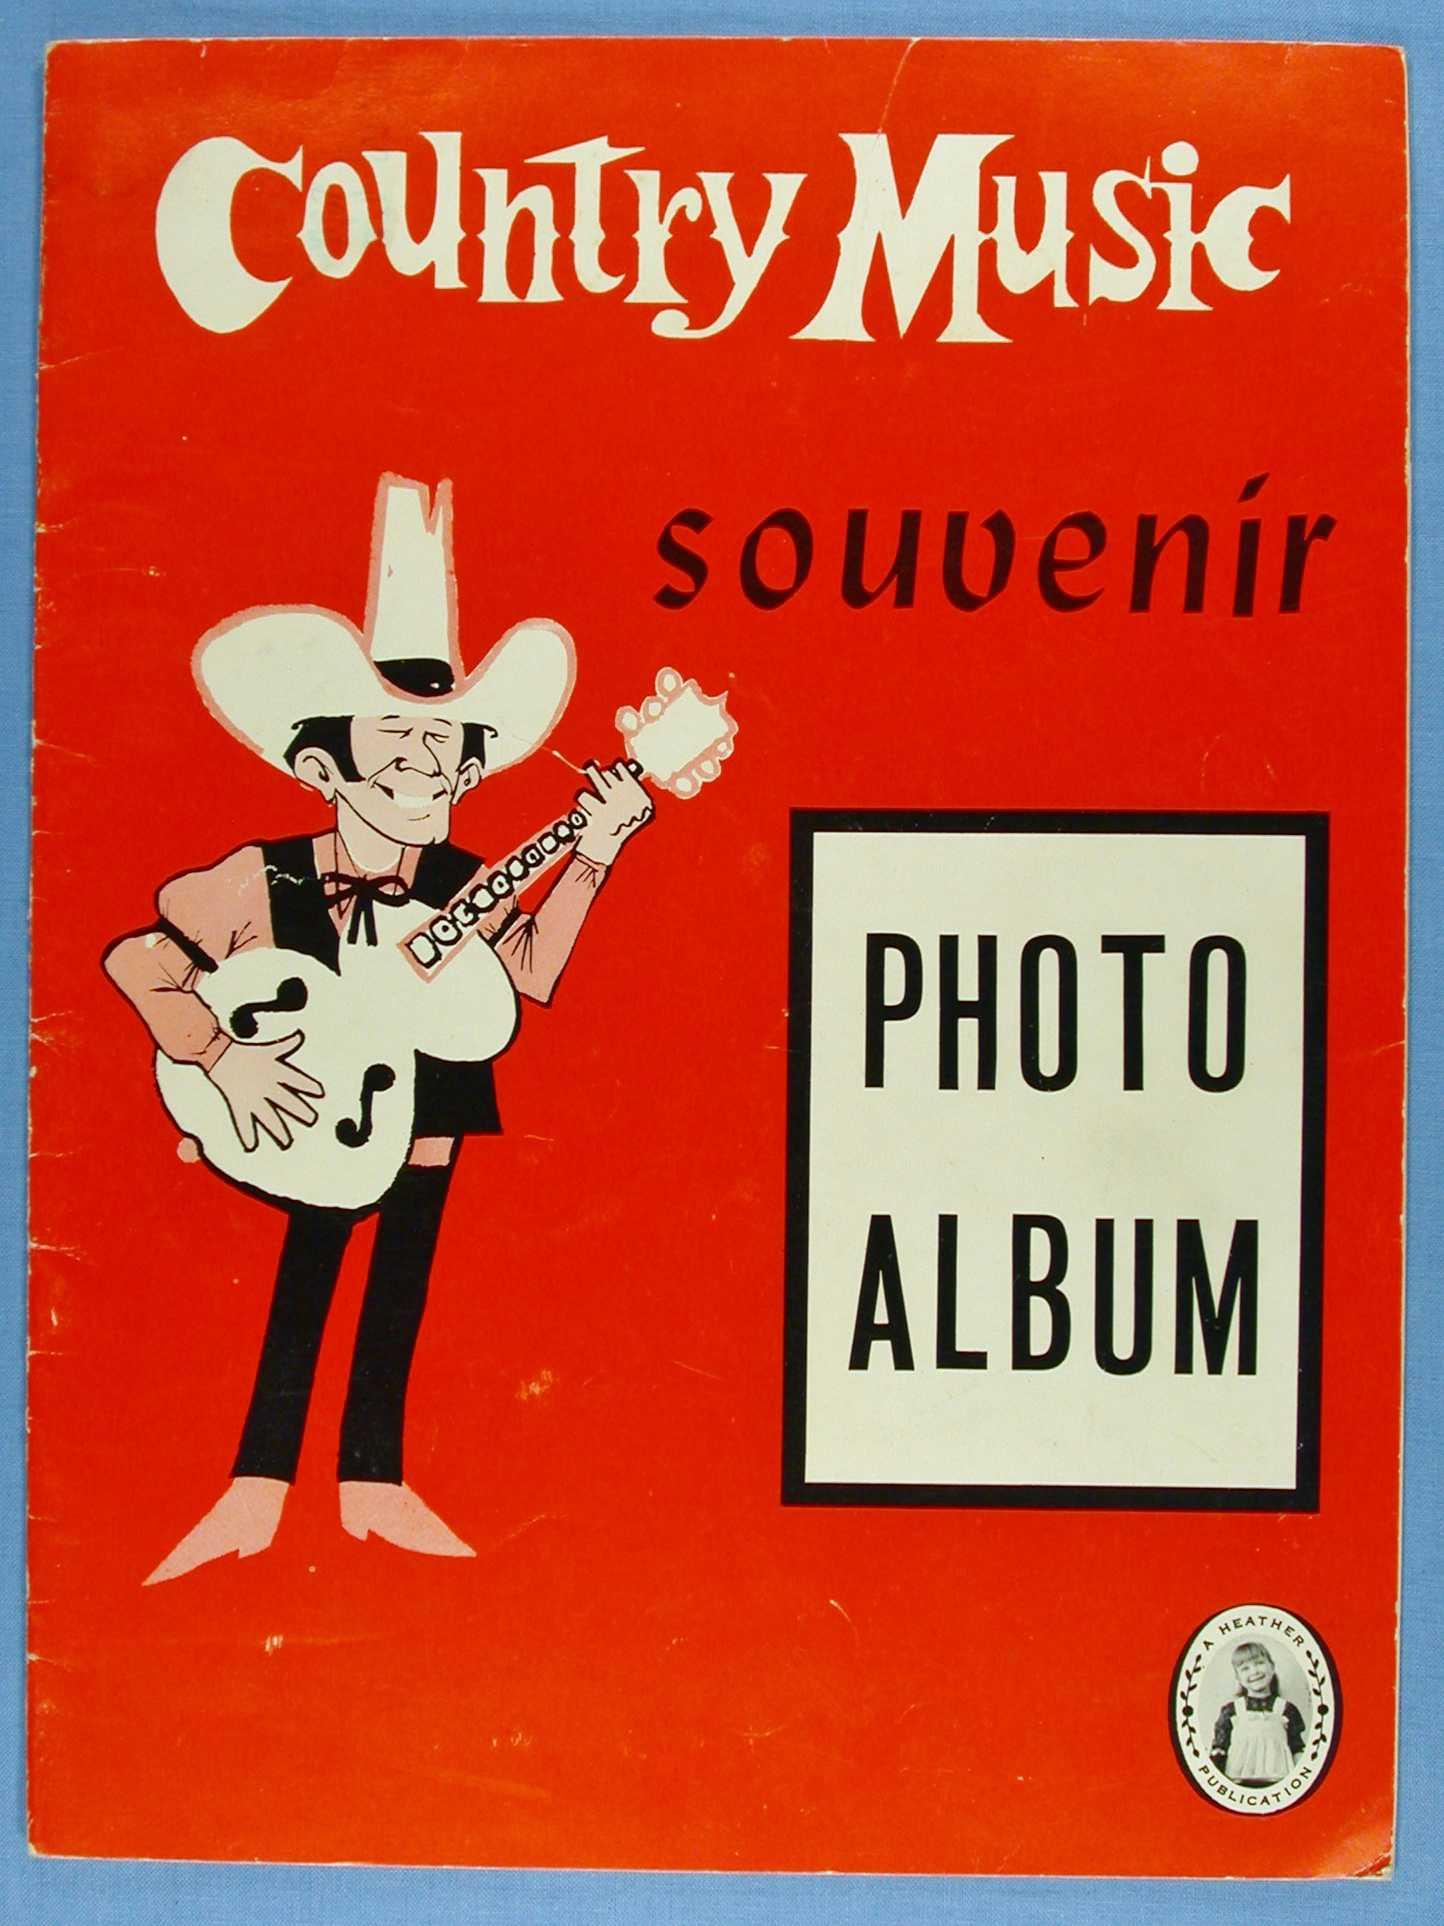 Country Music Souvenir Photo Album, Staff